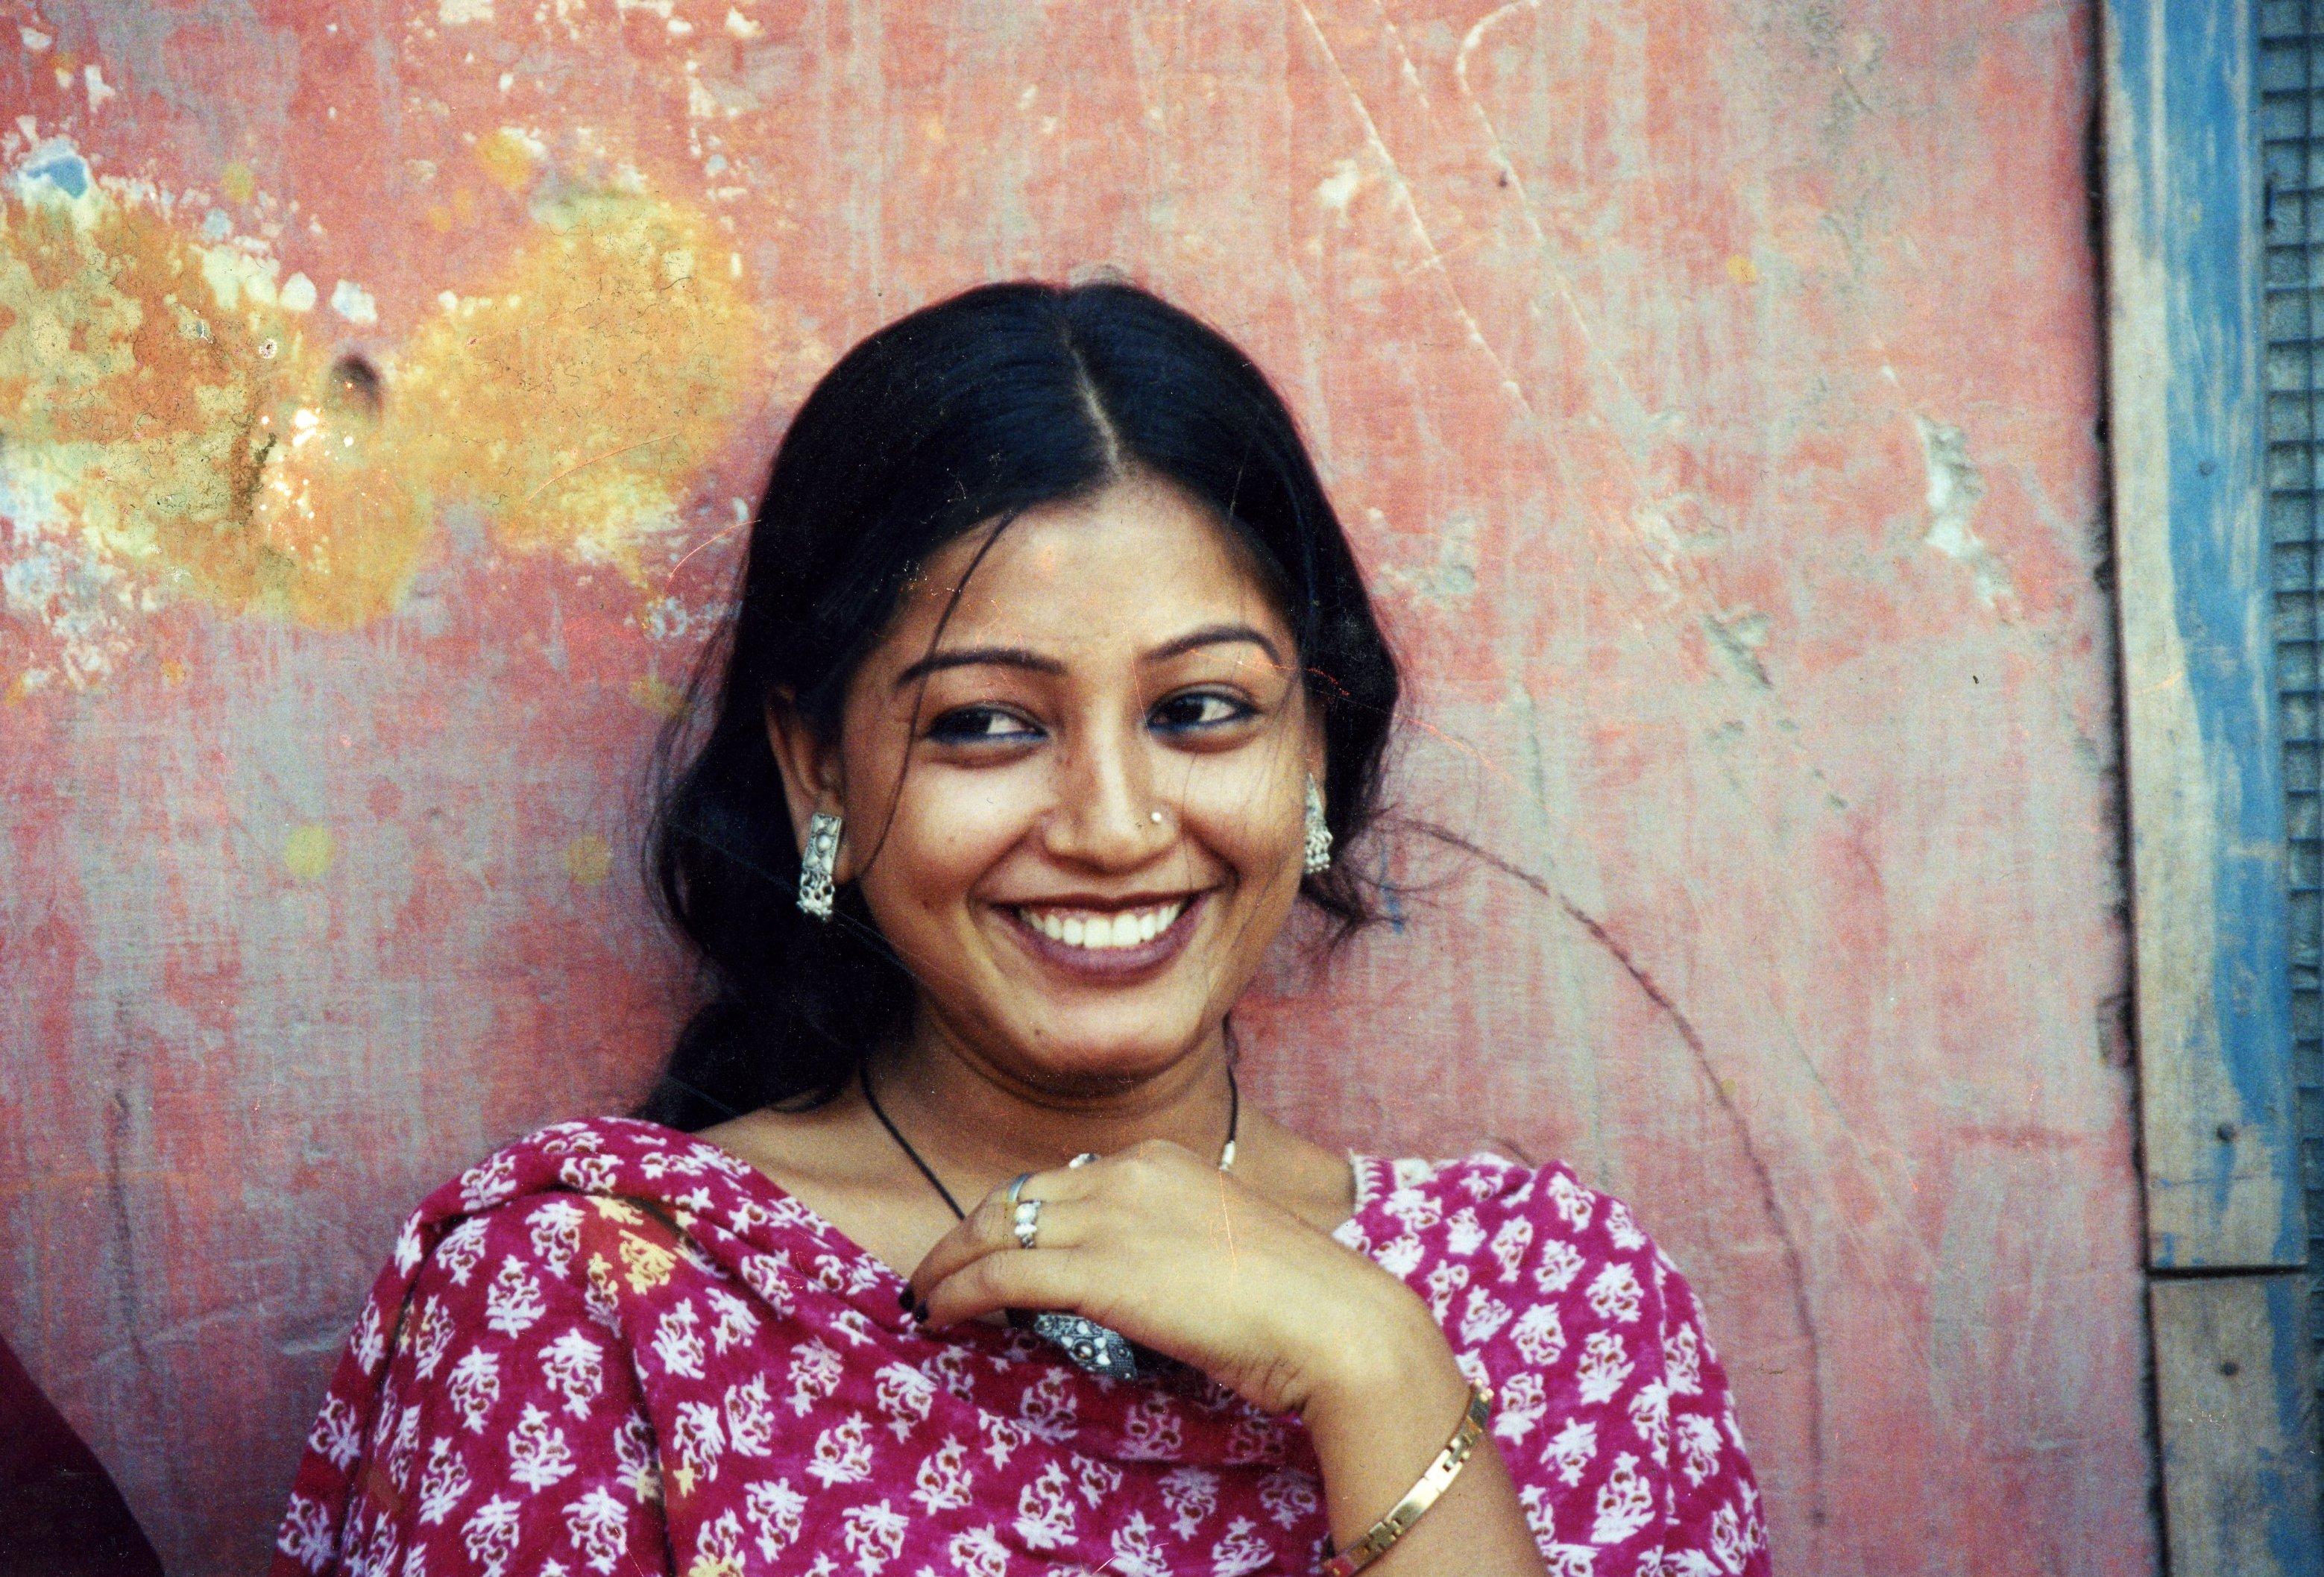 Indian woman pics 19